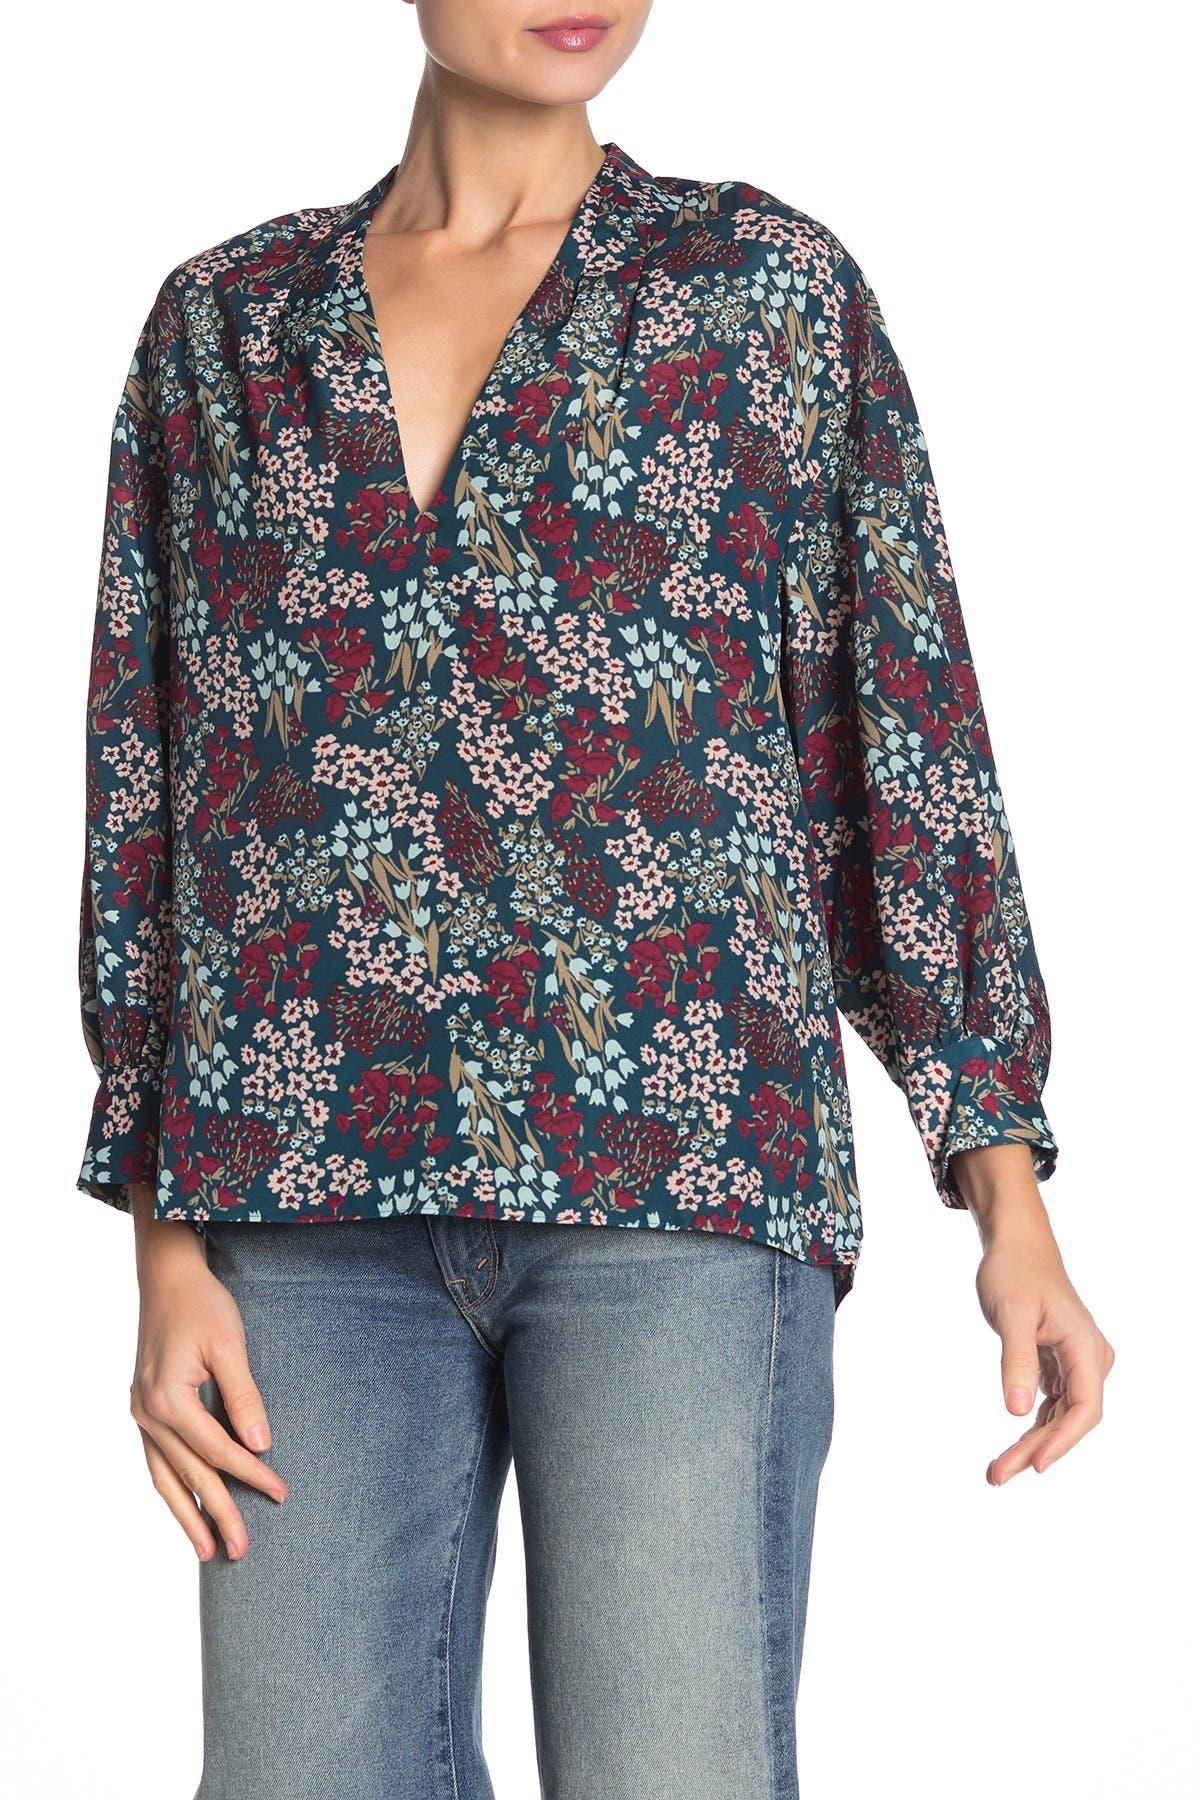 Image of Joie Ninarika Floral Long Sleeve Blouse